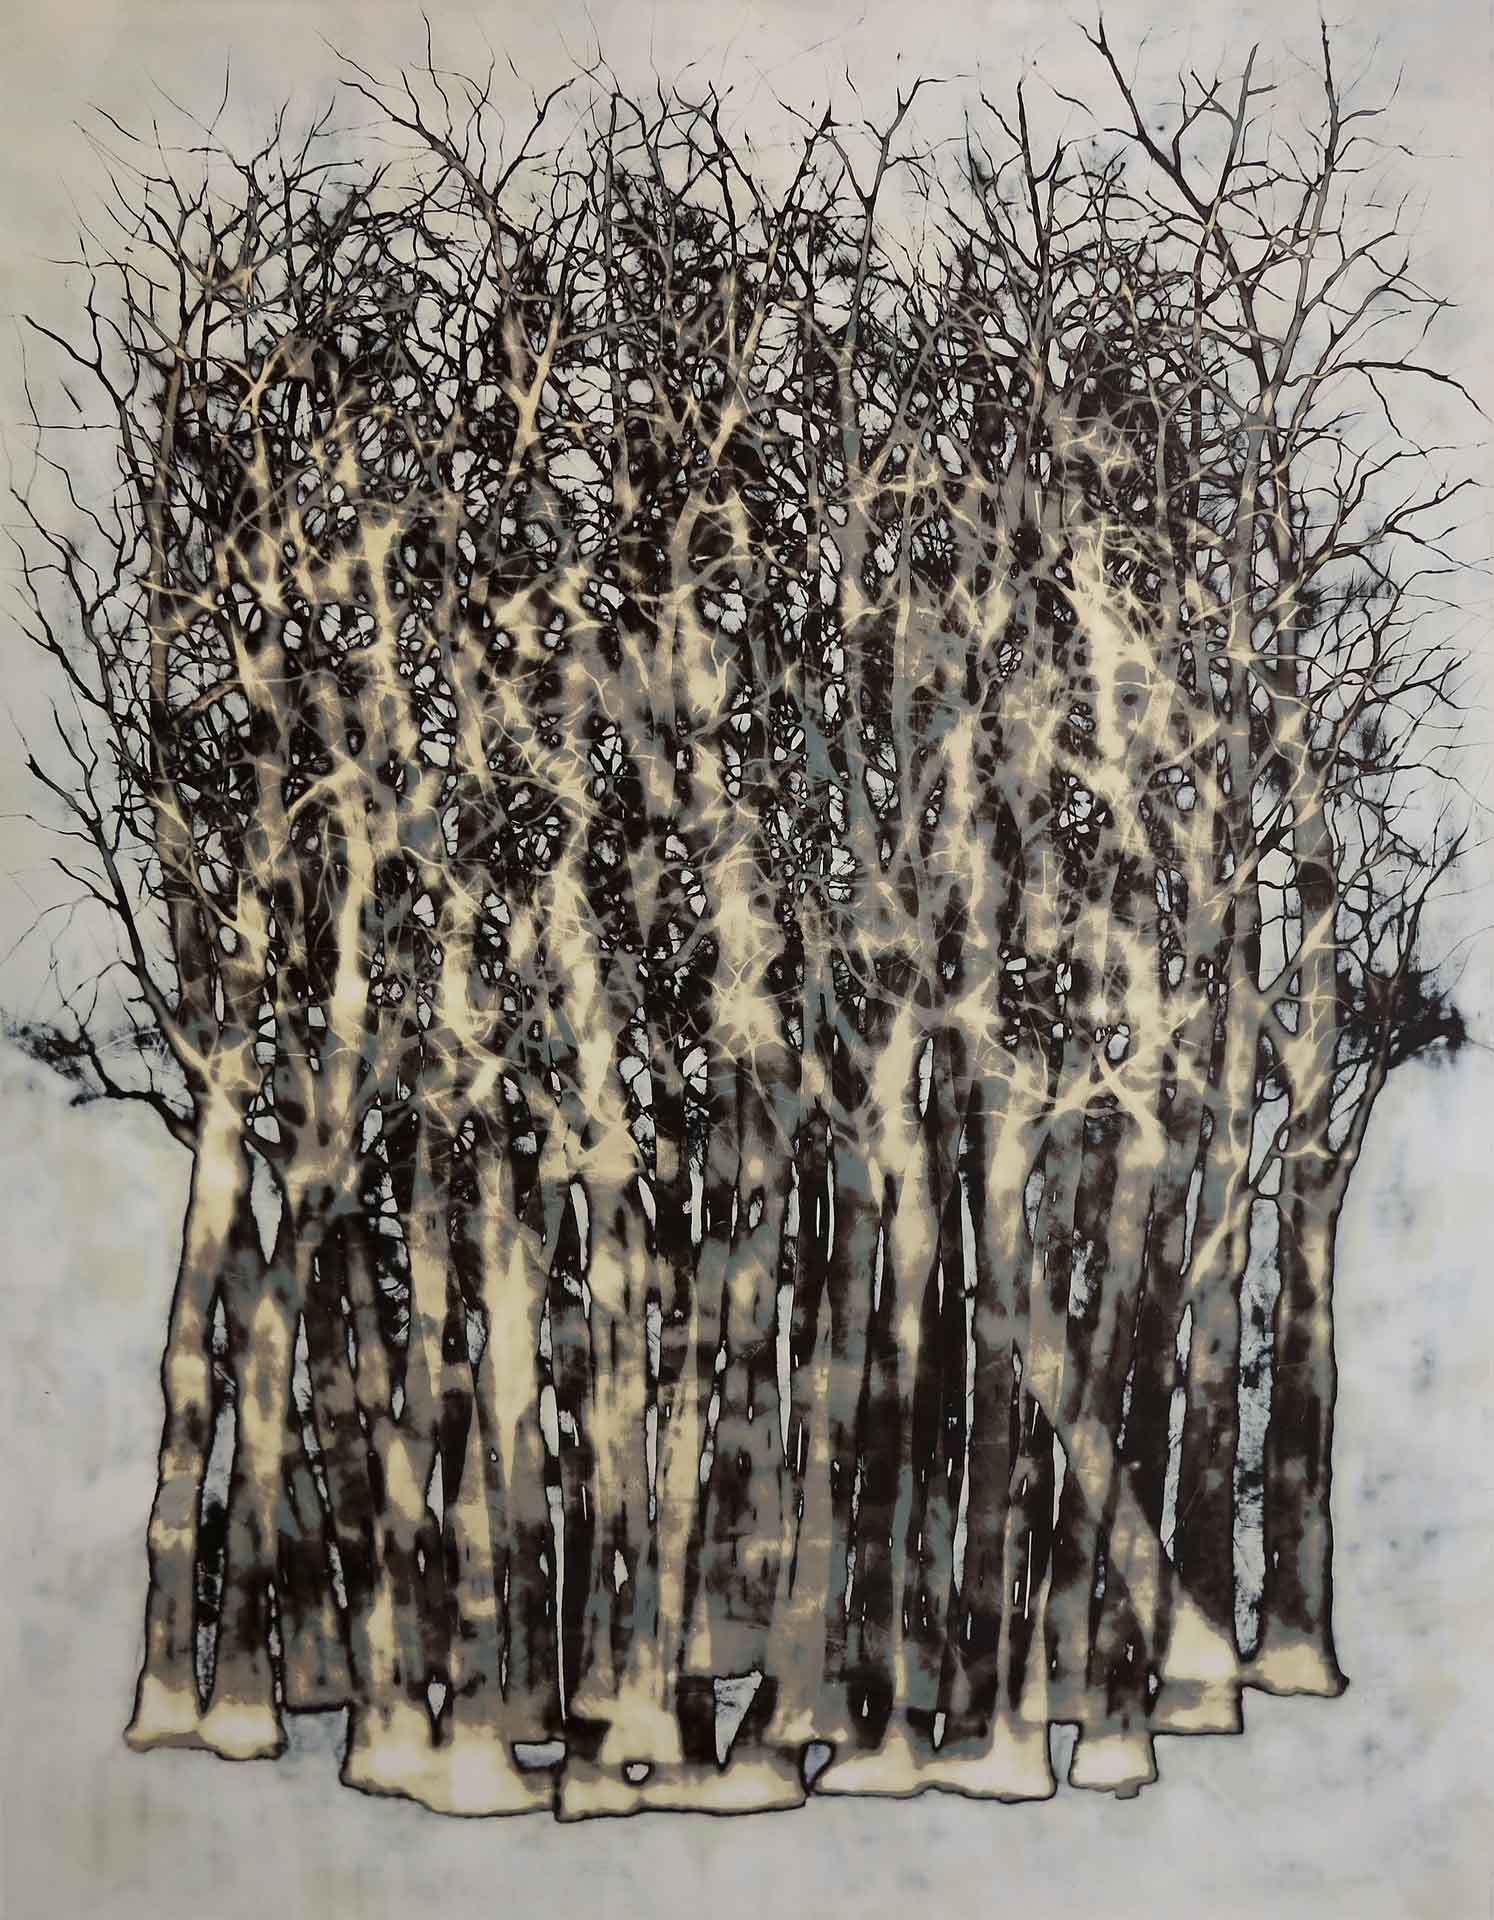 Tuval üzeri akrilik – Acrylic on canvas 110*140 cm